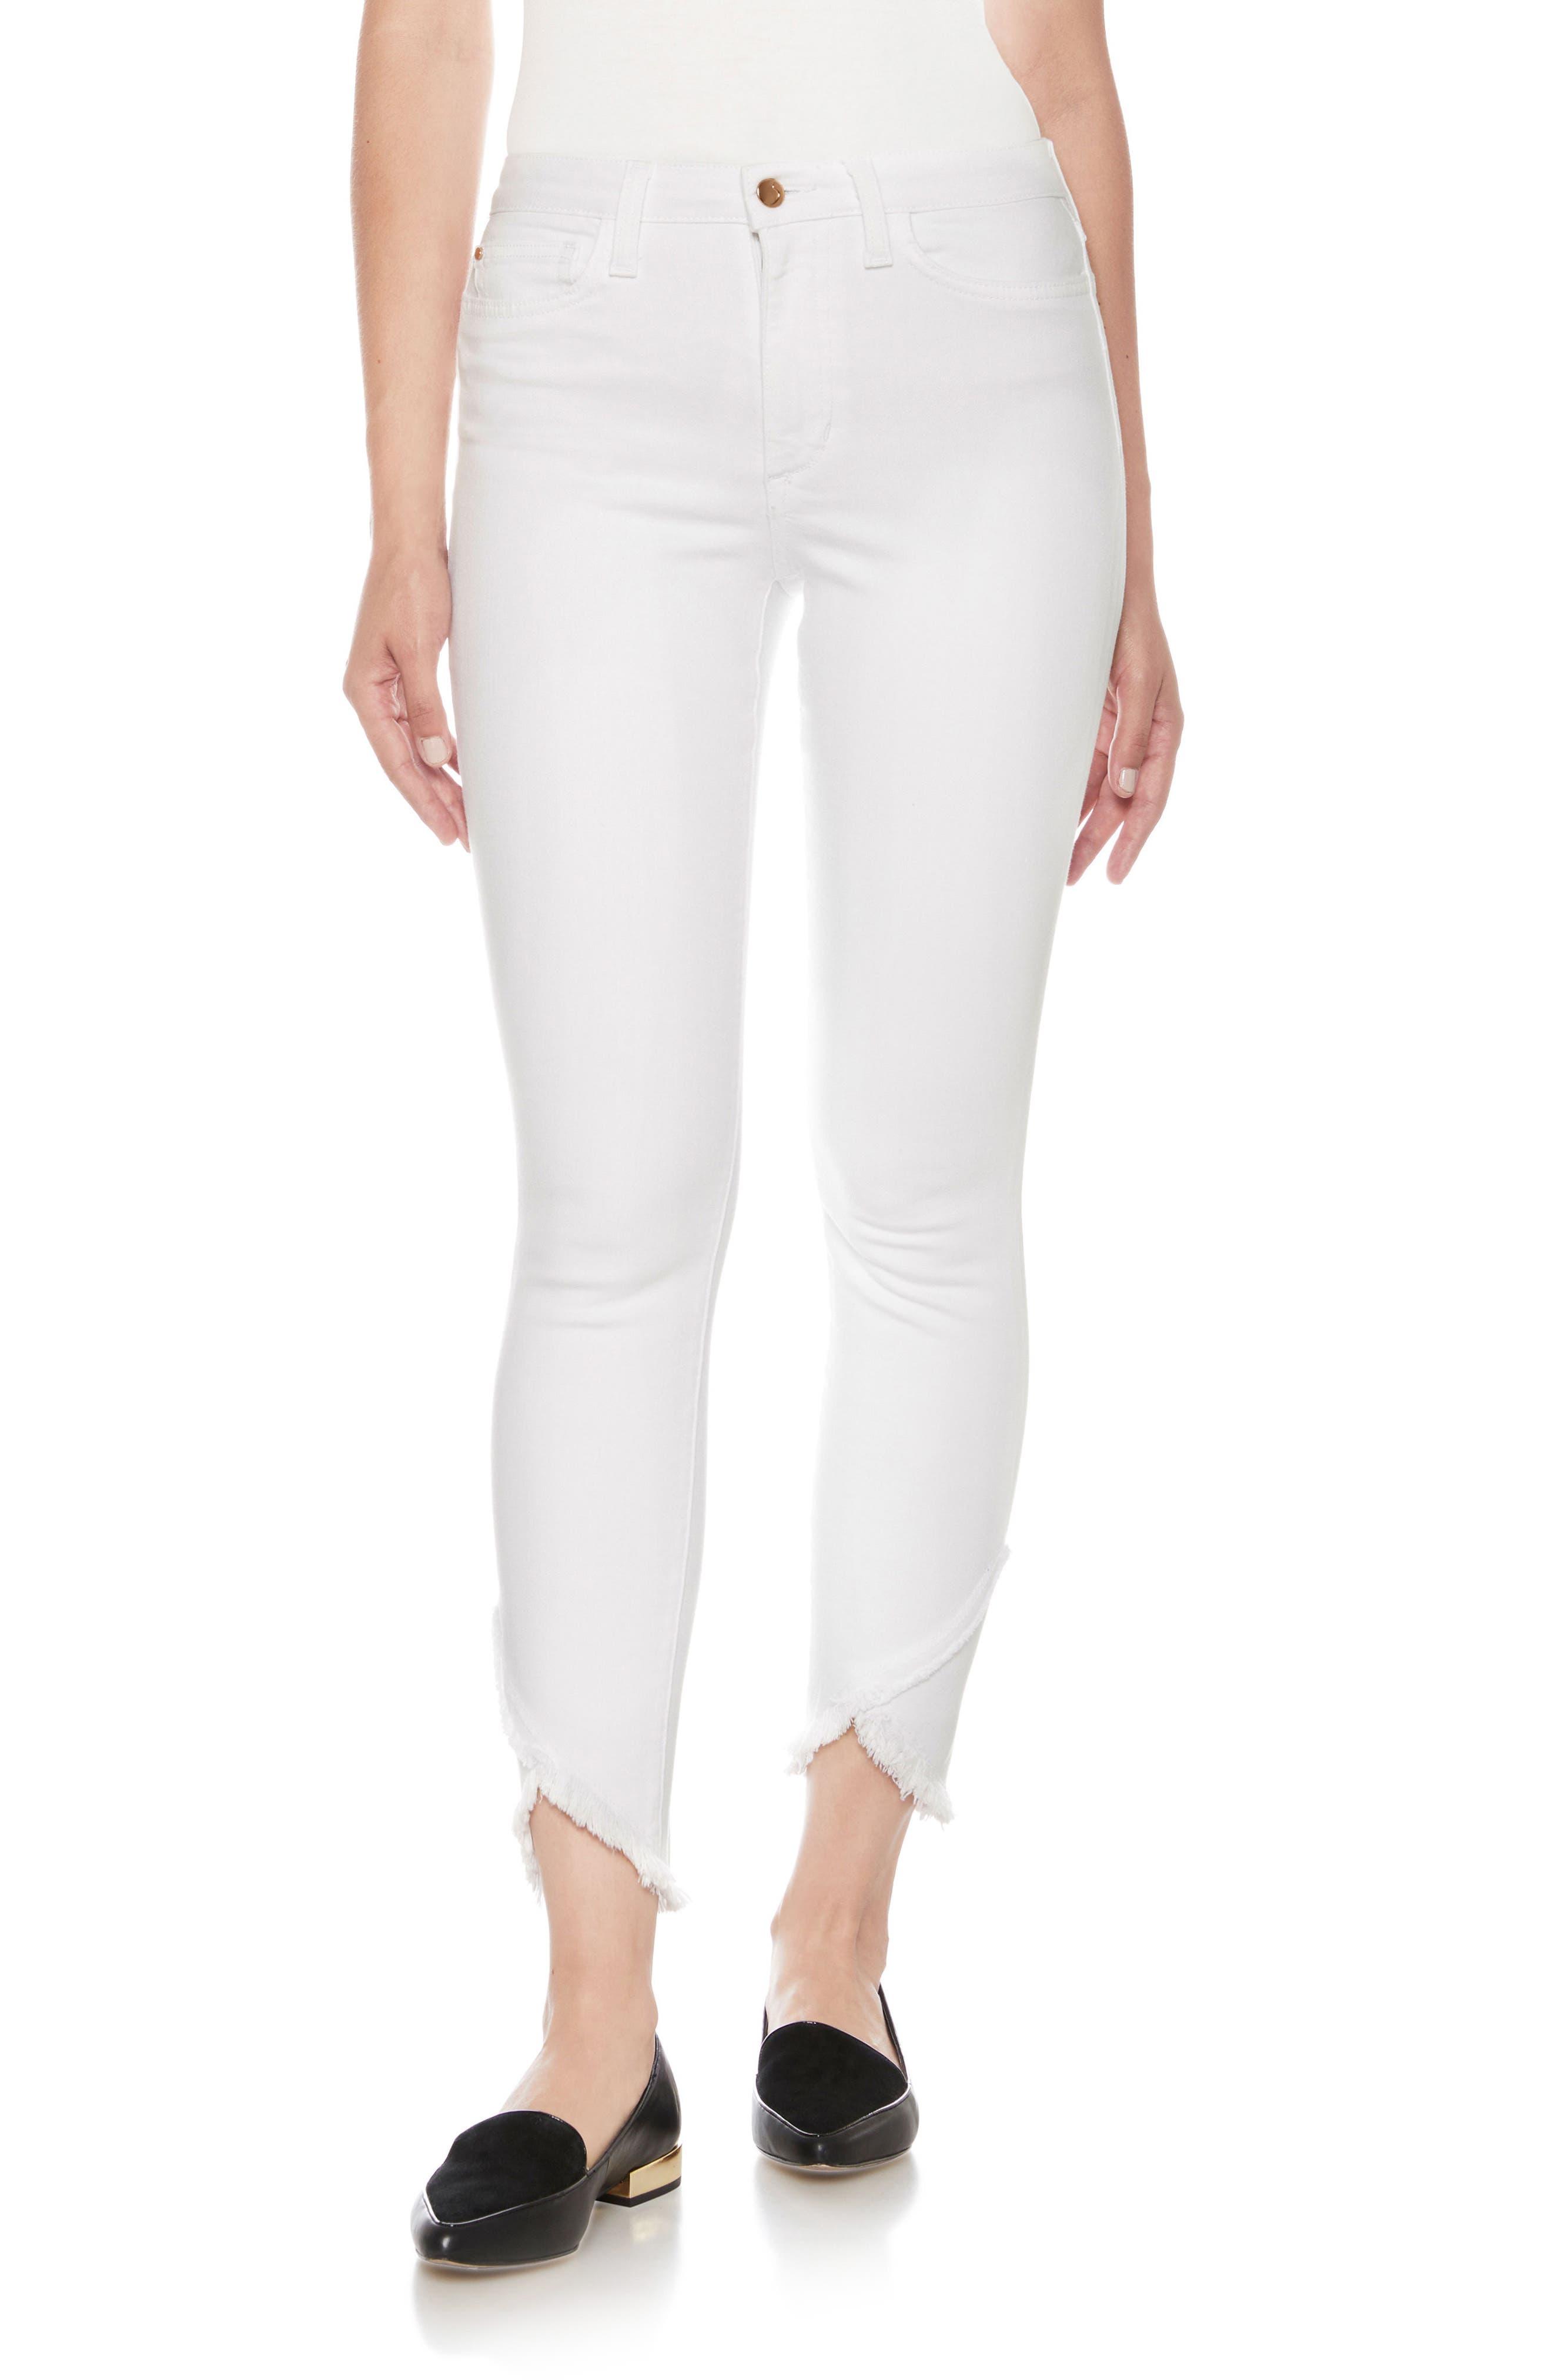 Alternate Image 1 Selected - Joe's Flawless - Charlie High Waist Tulip Hem Ankle Skinny Jeans (Hennie)